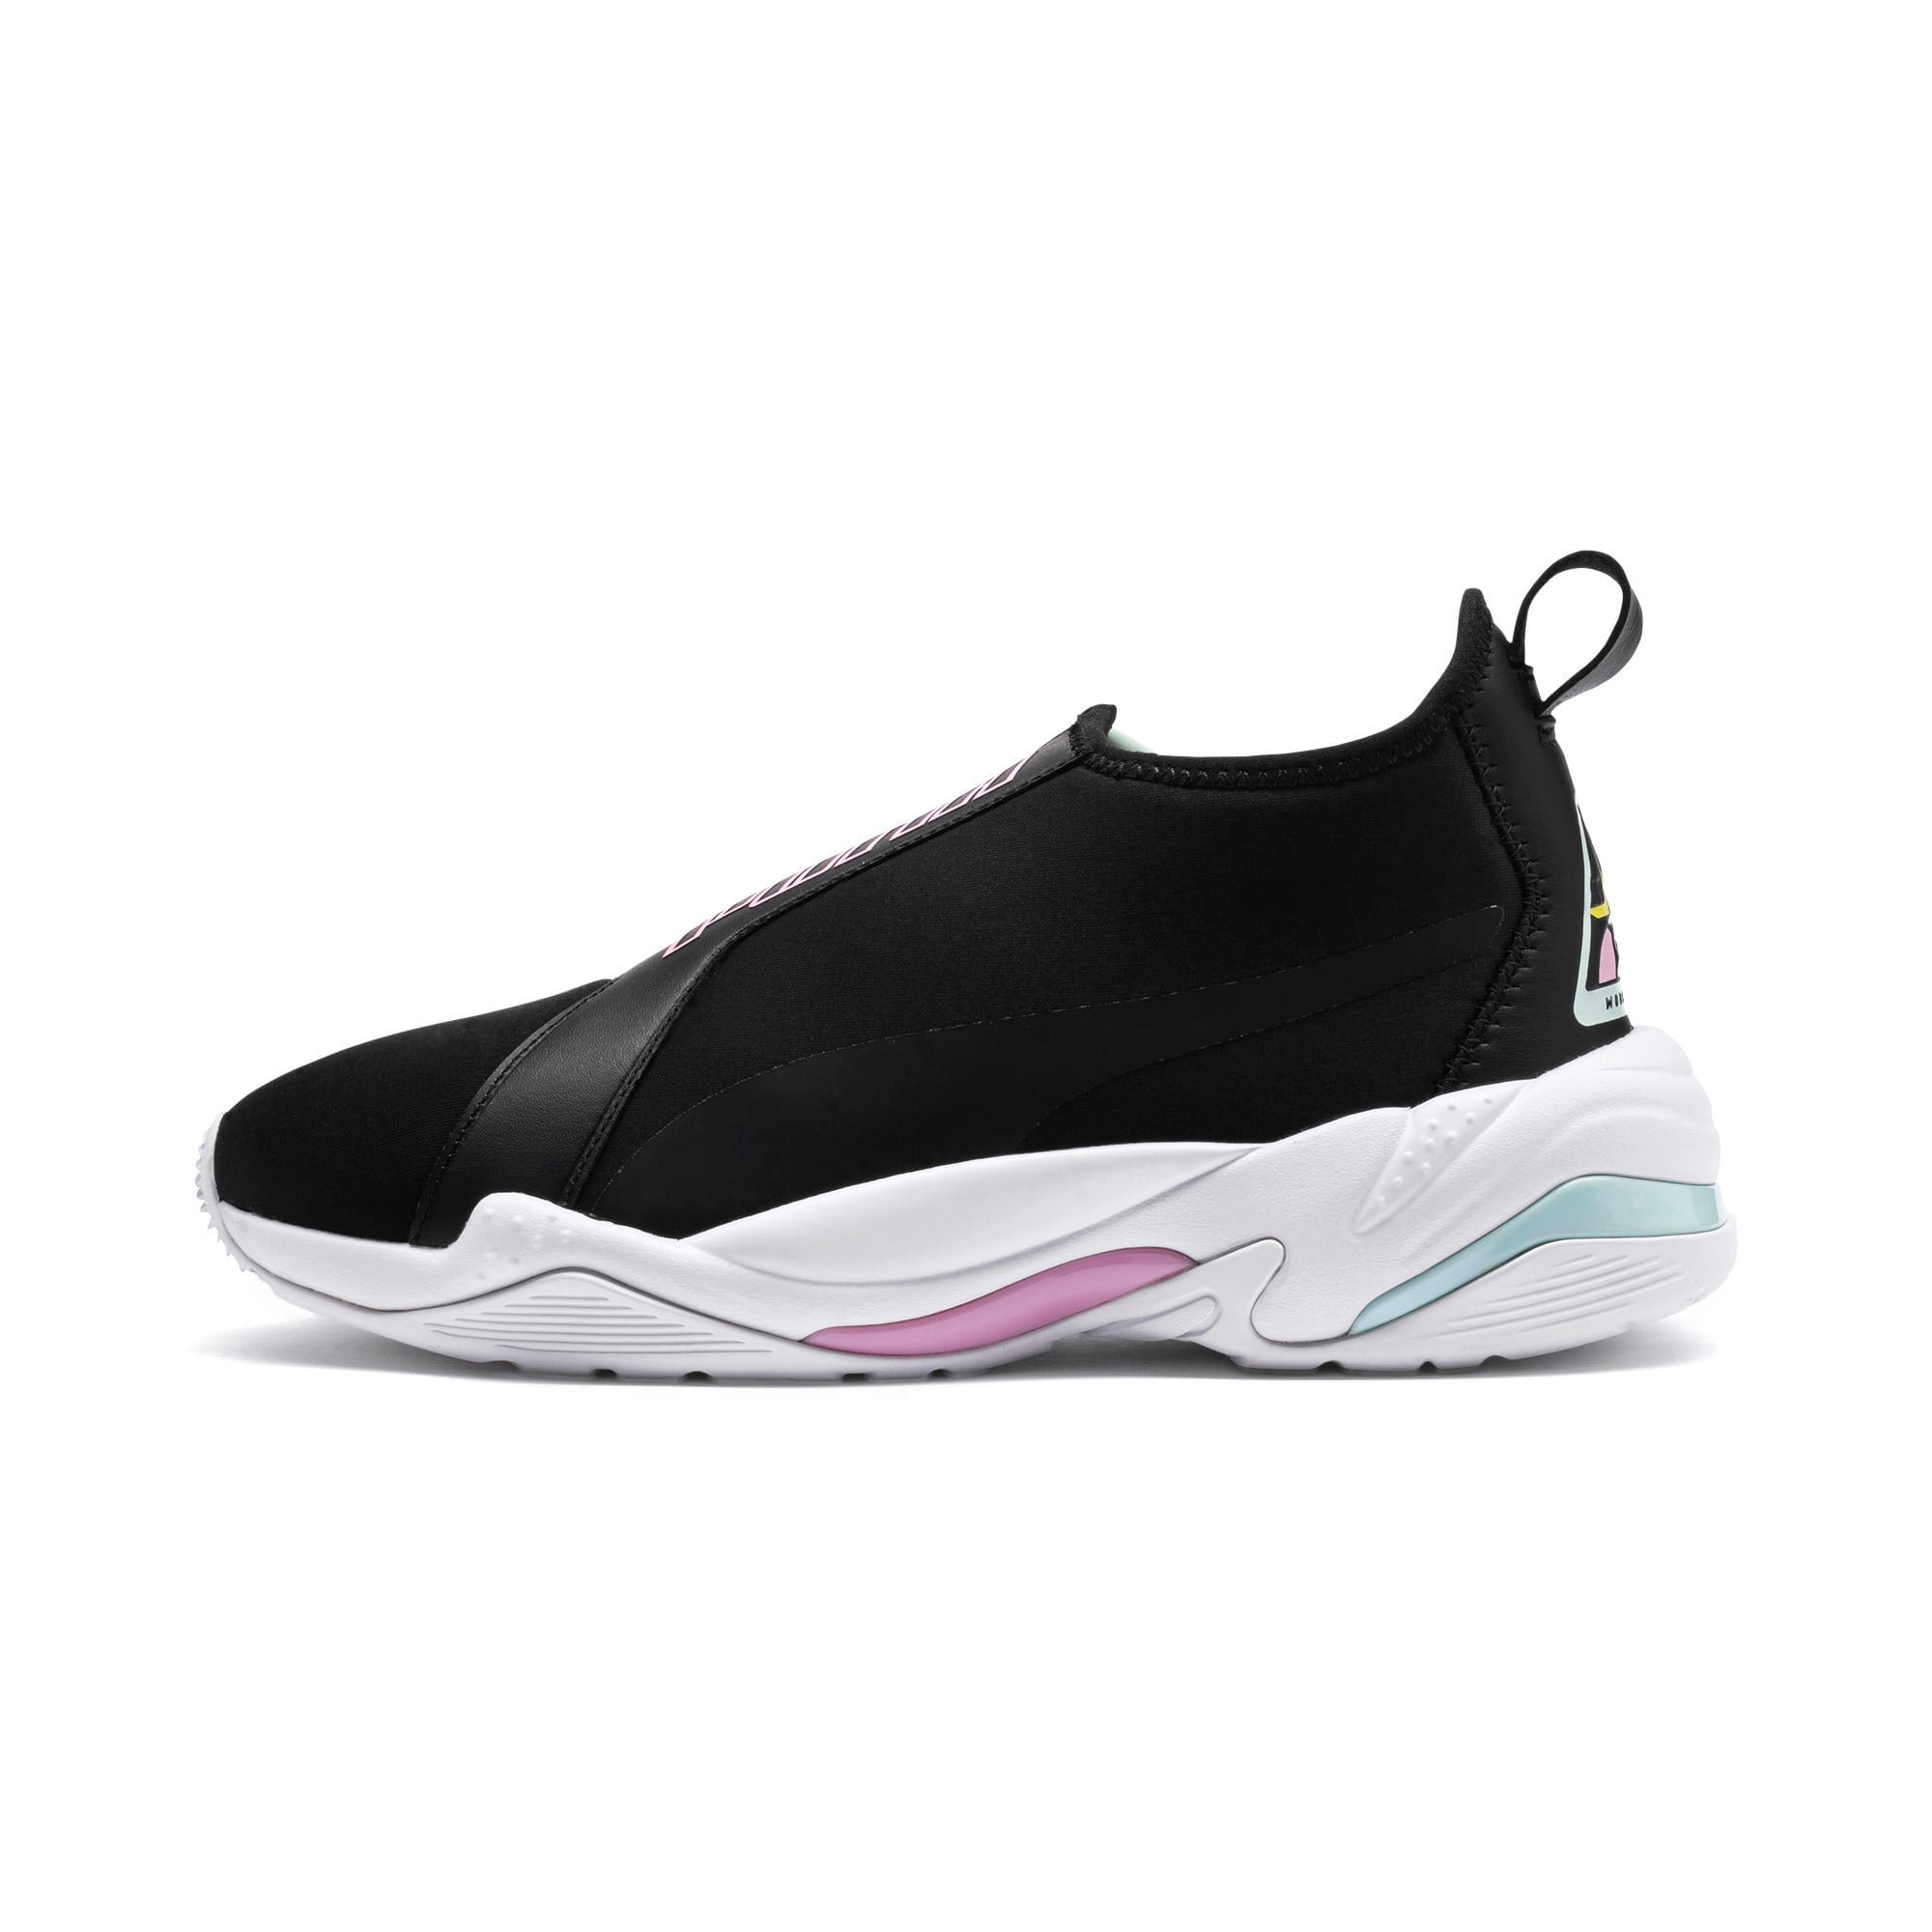 Miniatura 1 de Zapatos deportivos para mujer Thunder Trailblazer, Puma Black-Pale Pink, mediano